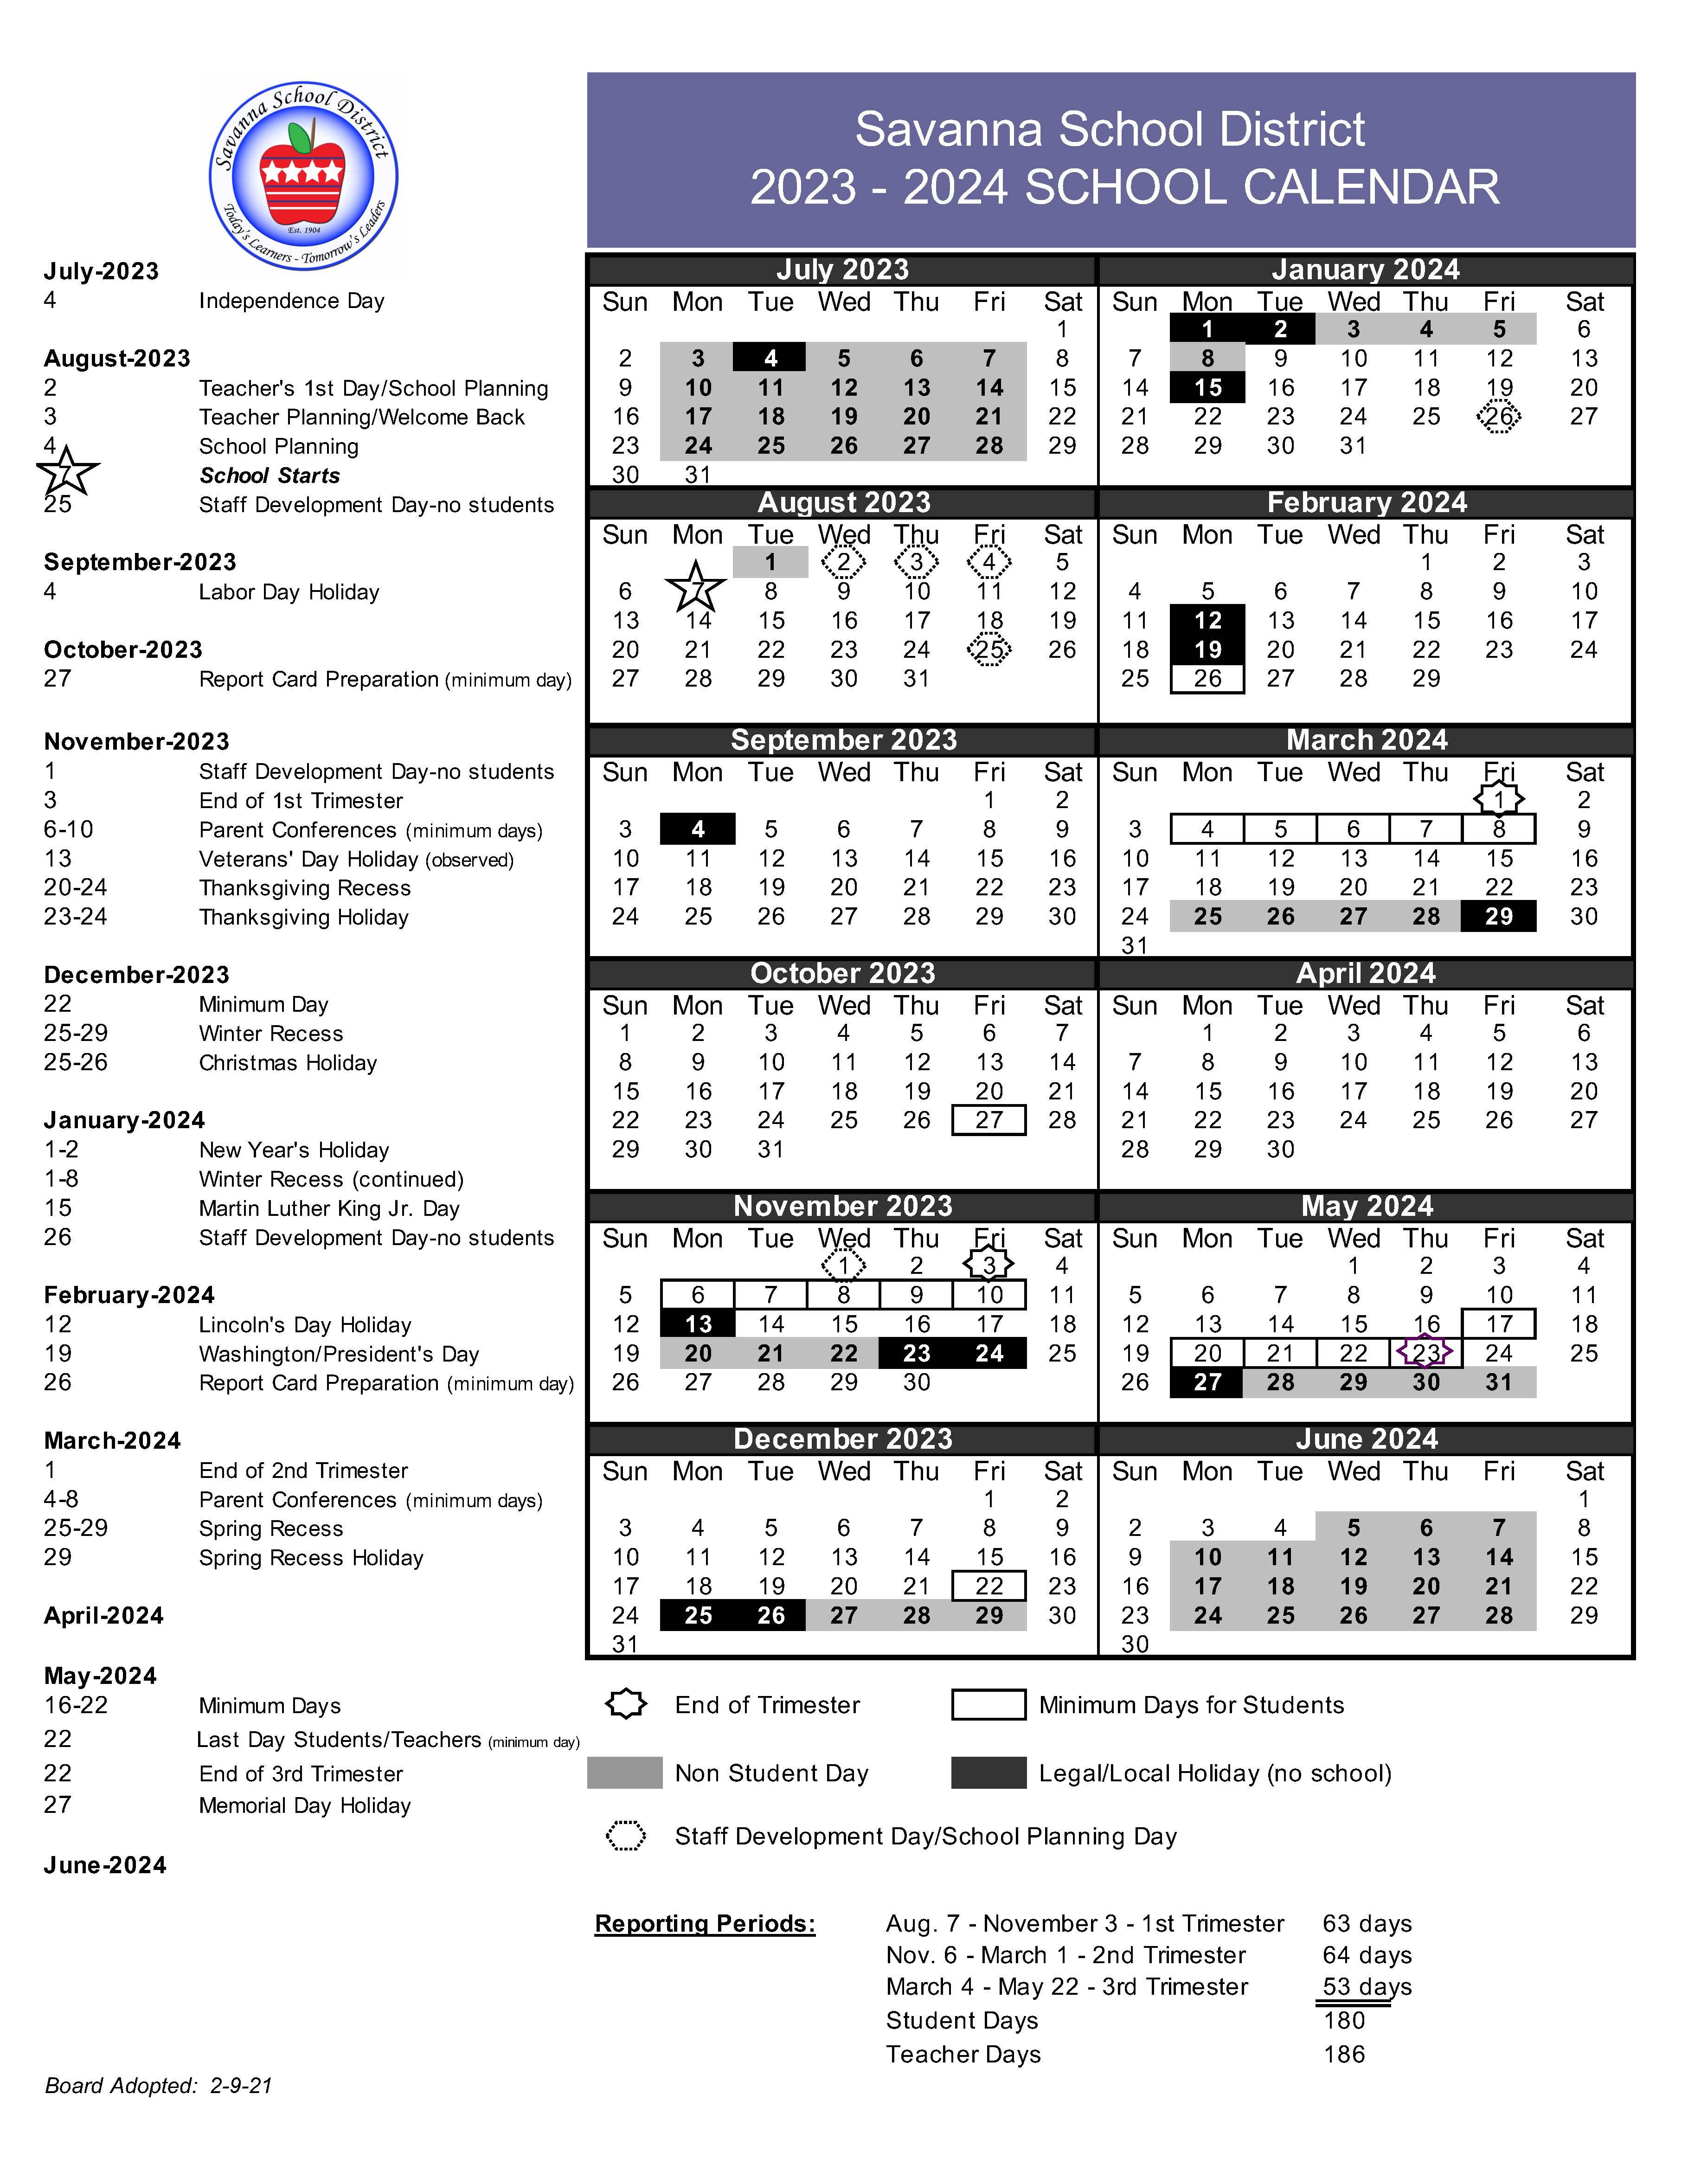 Csulb Academic Calendar 2022 23.Savanna School District Academic Calendar